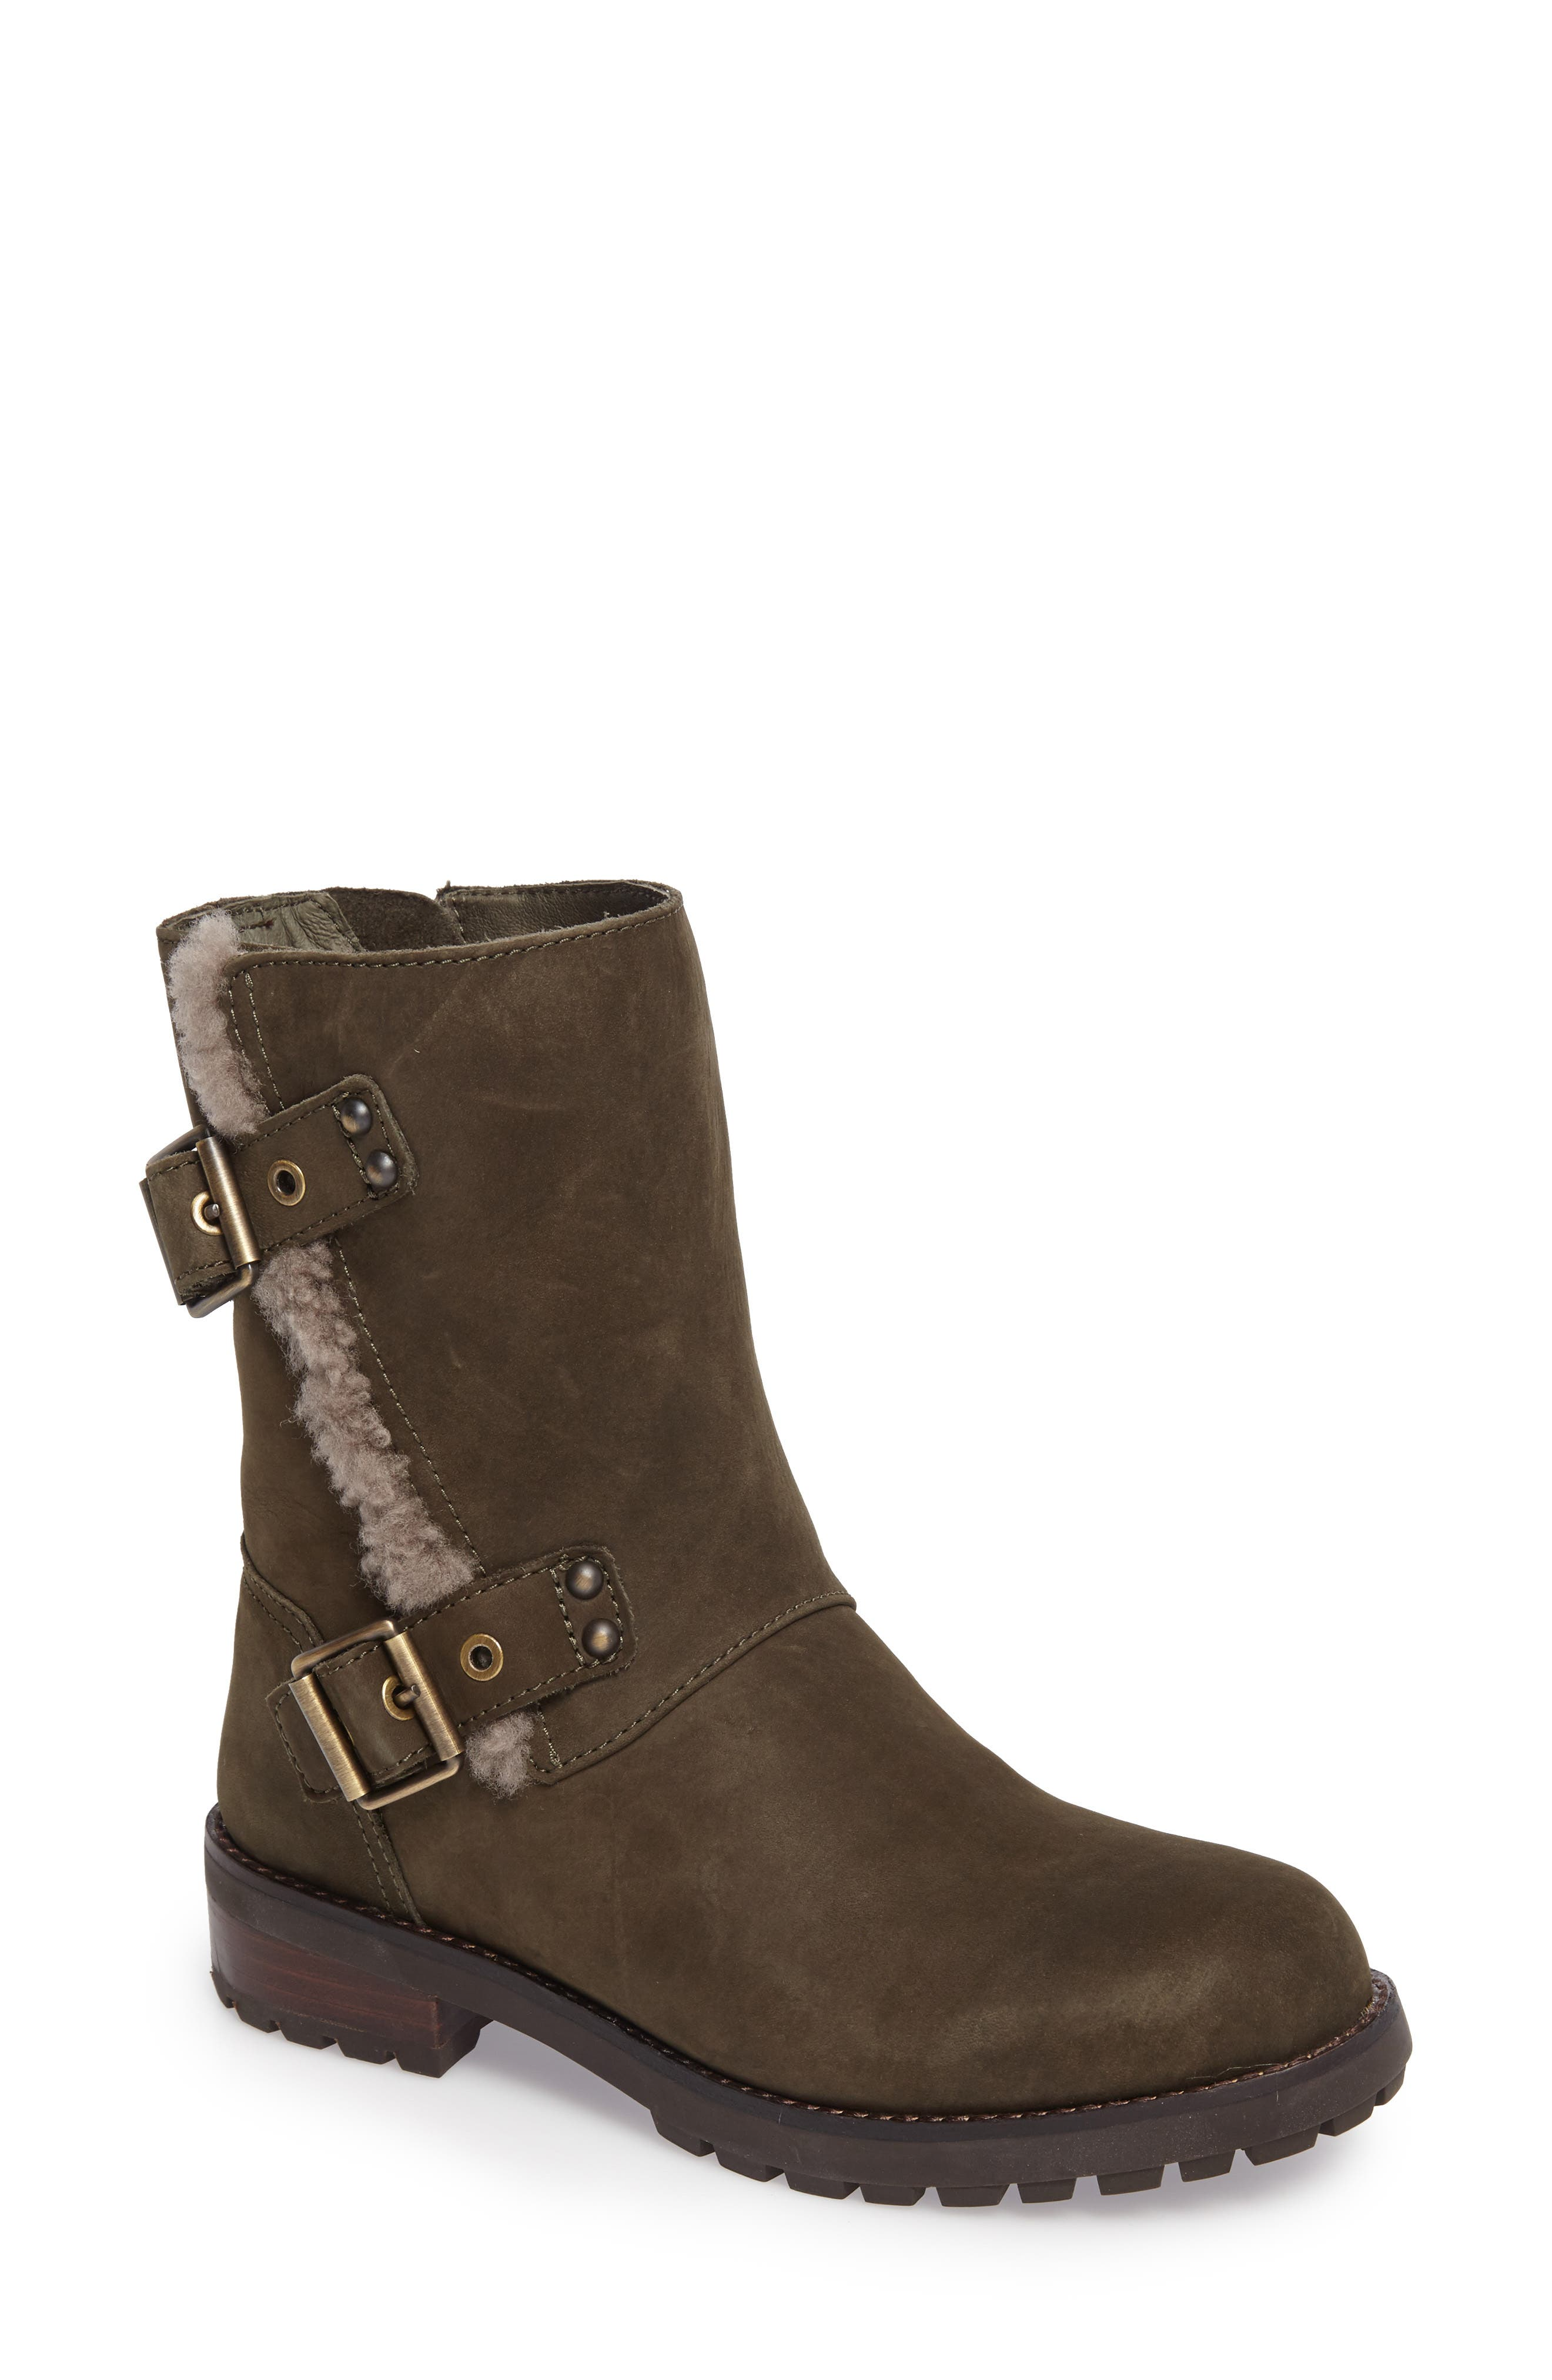 Alternate Image 1 Selected - UGG® Niels Water Resistant Genuine Shearling Boot (Women)